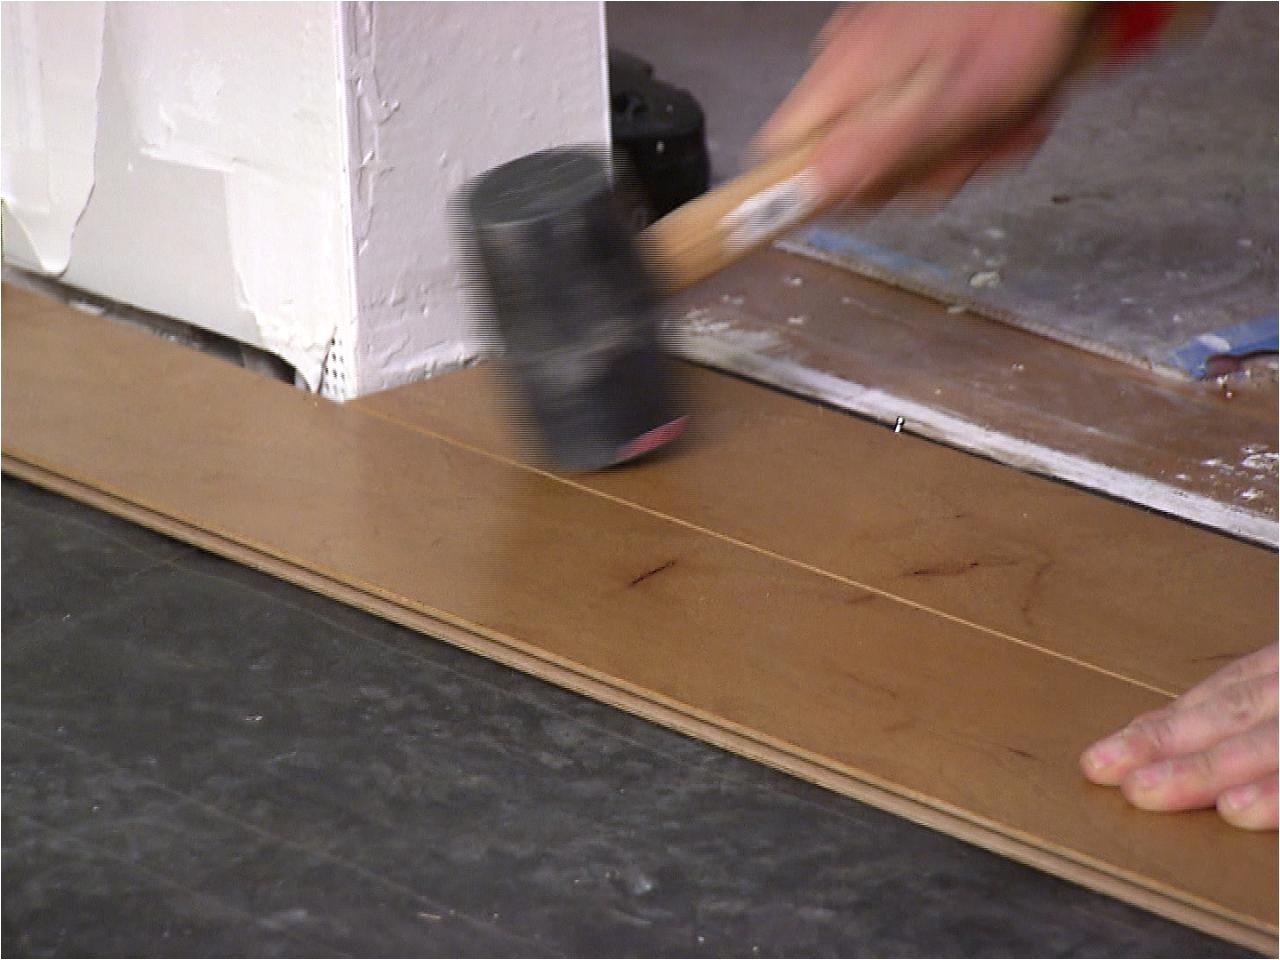 Removing Glue From Engineered Hardwood Floors How to Install An Engineered Hardwood Floor How tos Diy